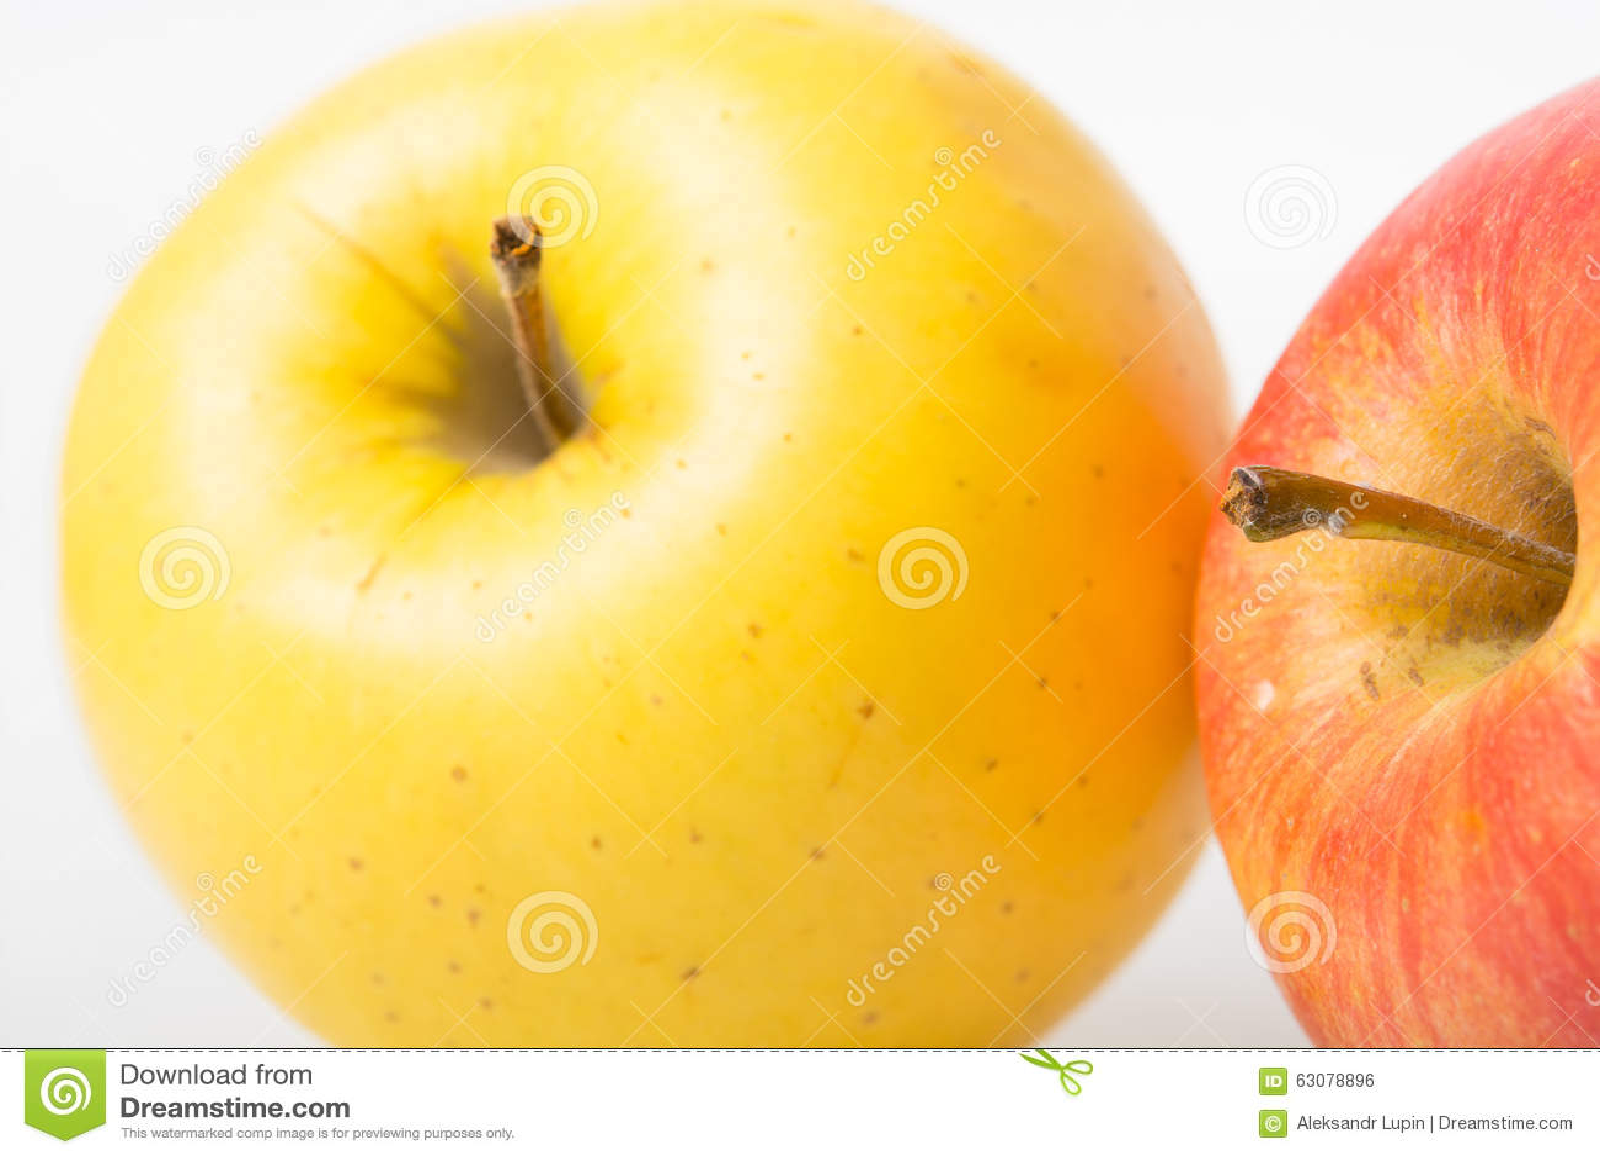 Download Grand Apple mûr jaune photo stock. Image du pomme, vitamines - 63078896